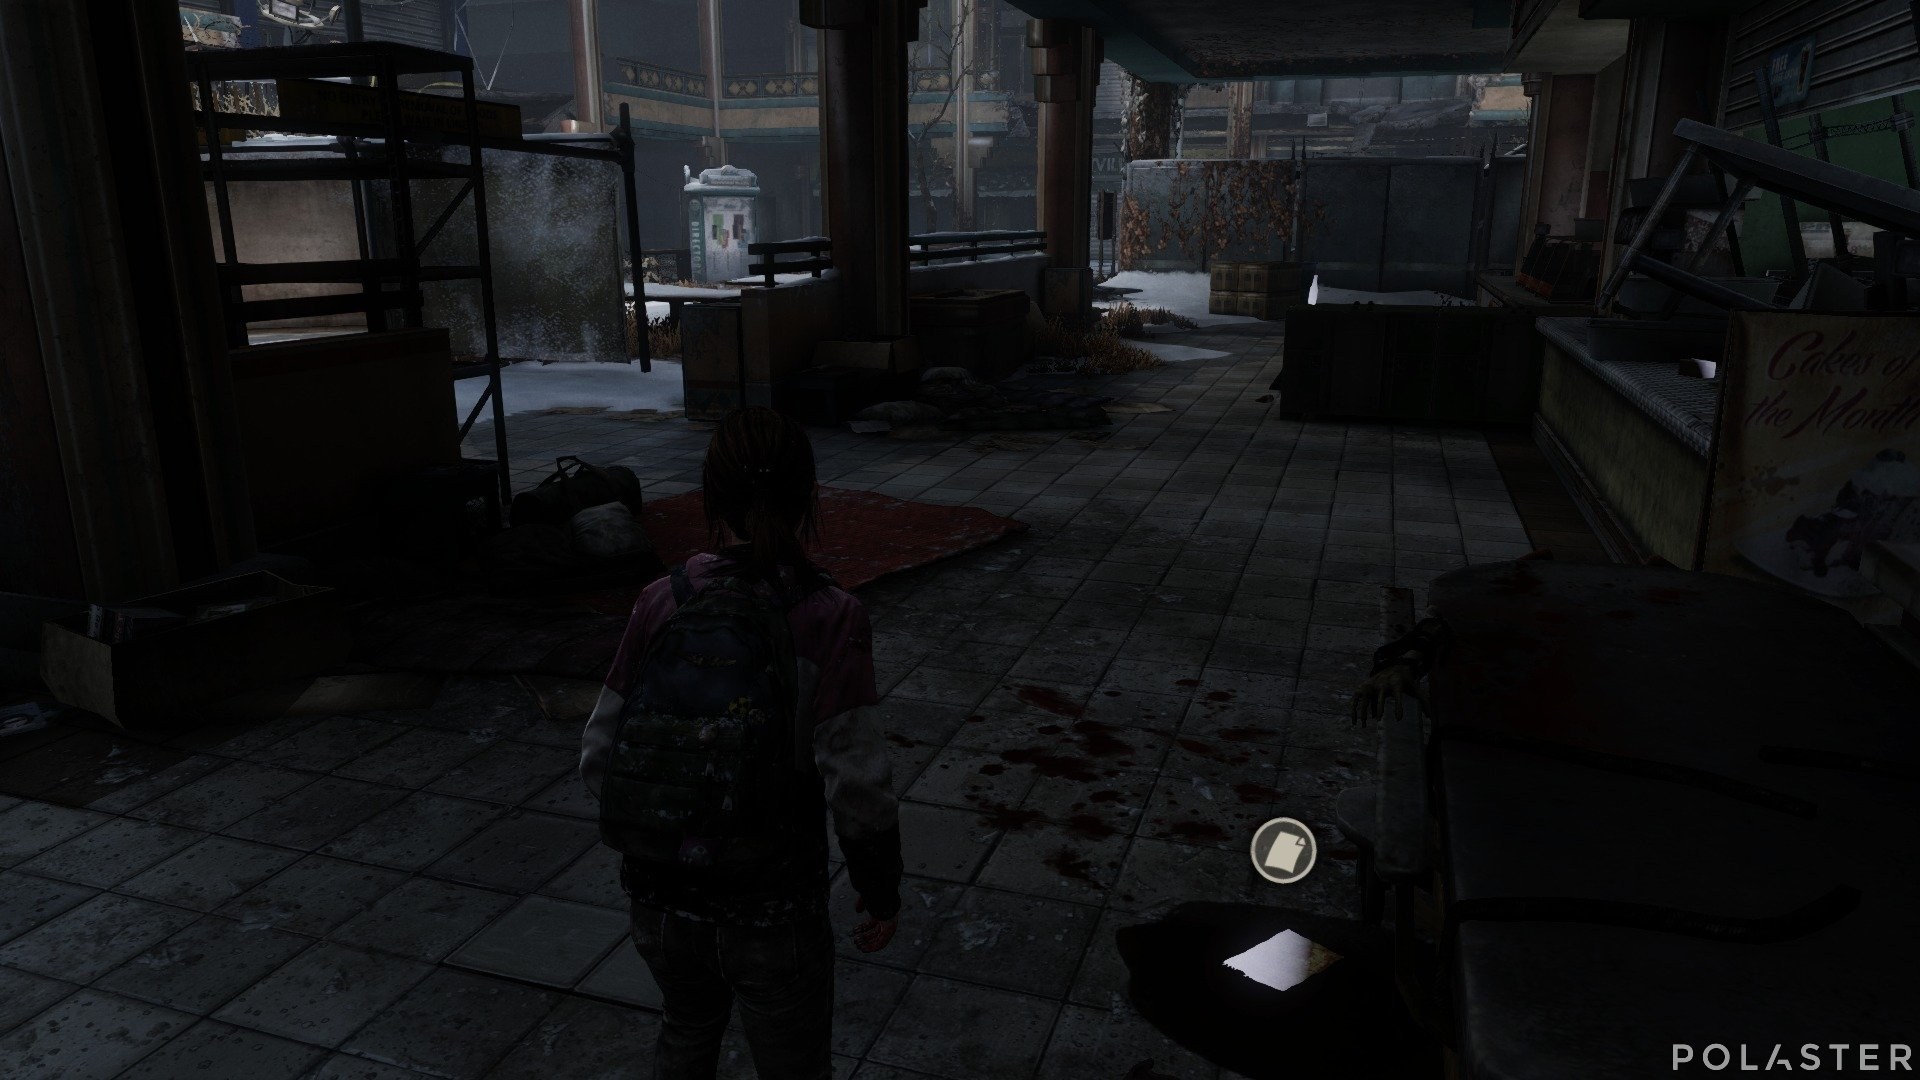 The Last of Us DLC Left Behind Artefacto Nota del atrio